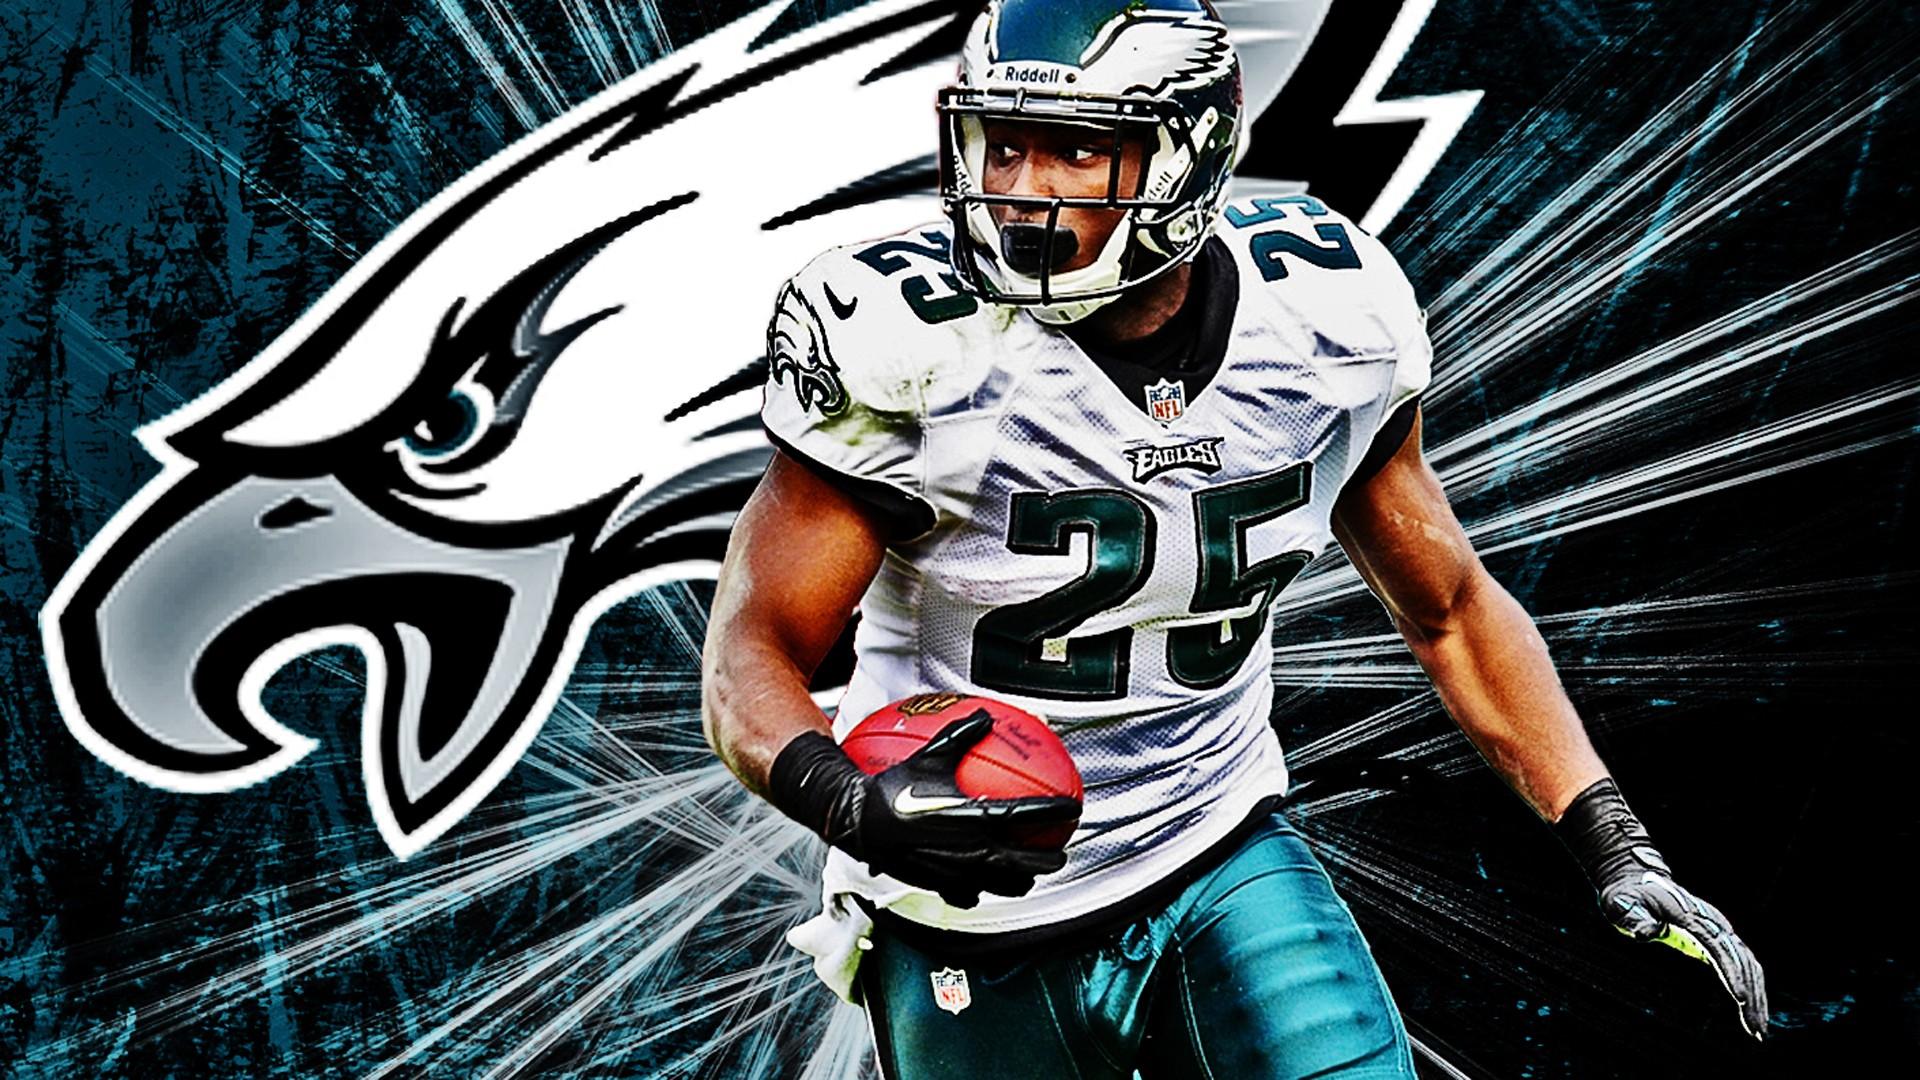 Philadelphia Eagles wallpaper ·① Download free amazing HD ...